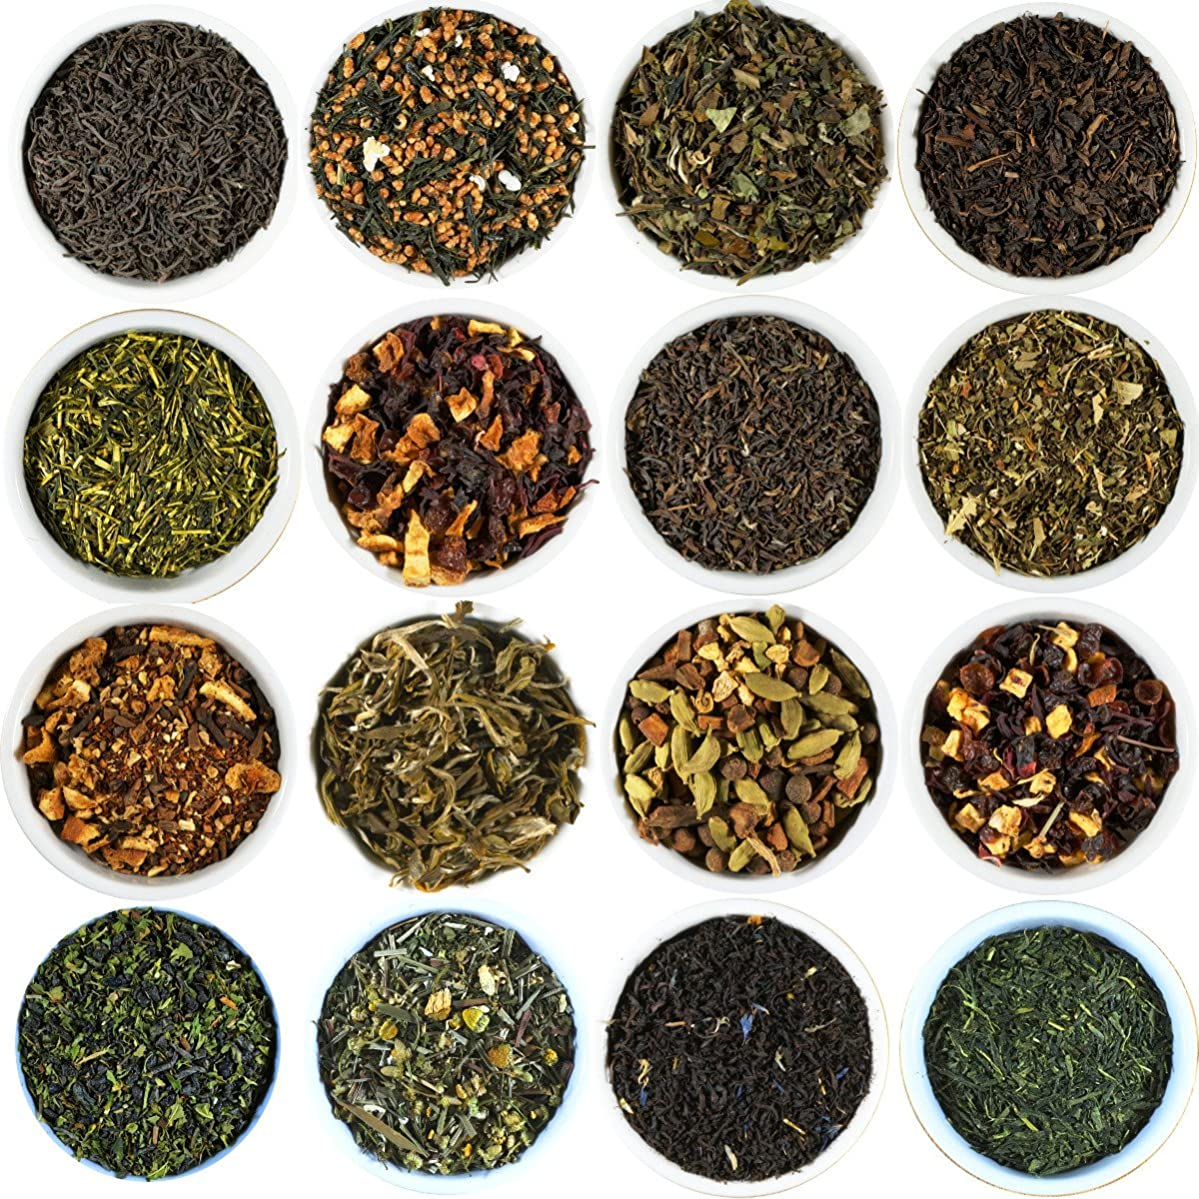 Jasmine Green Tea Sampler. Choose From 68 Varieties Of Loose Leaf Tea. Gourmet Tea Sampler Makes 3-5 Servings. Beantown Tea & Spices Brand. (Jasmine 1st Grade Green Tea)